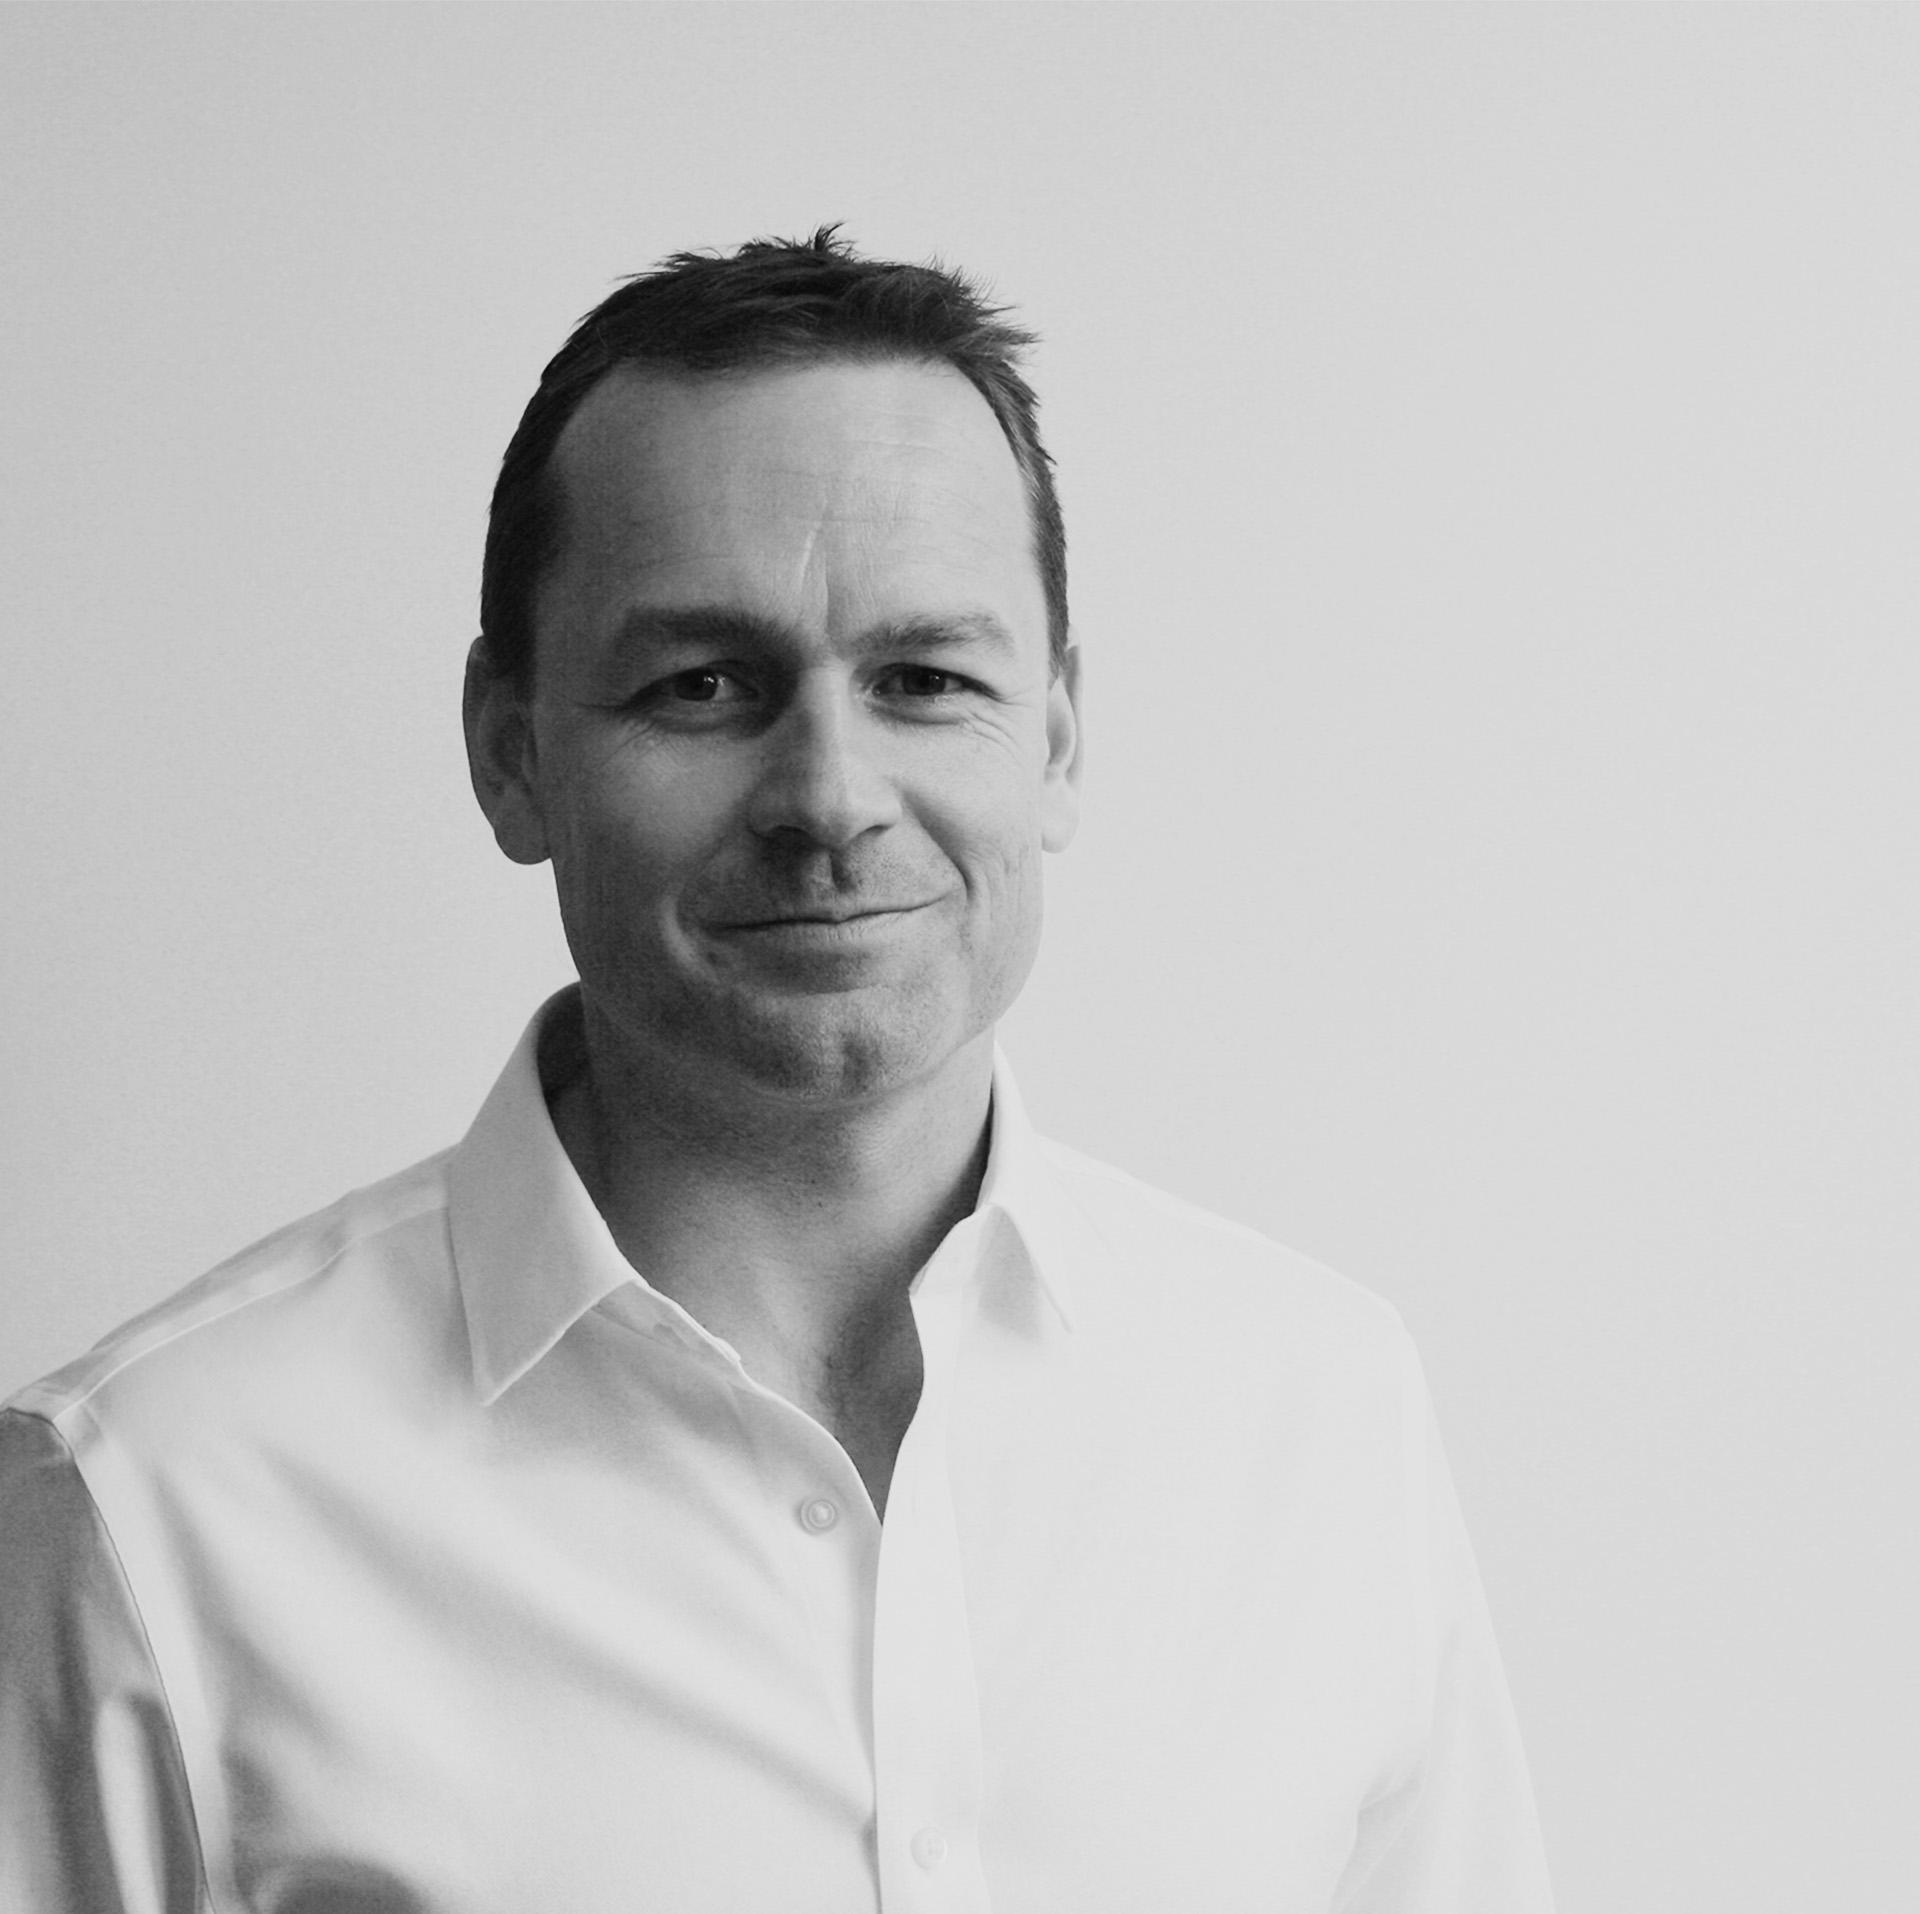 Paul Cameron, CEO of Booktrack